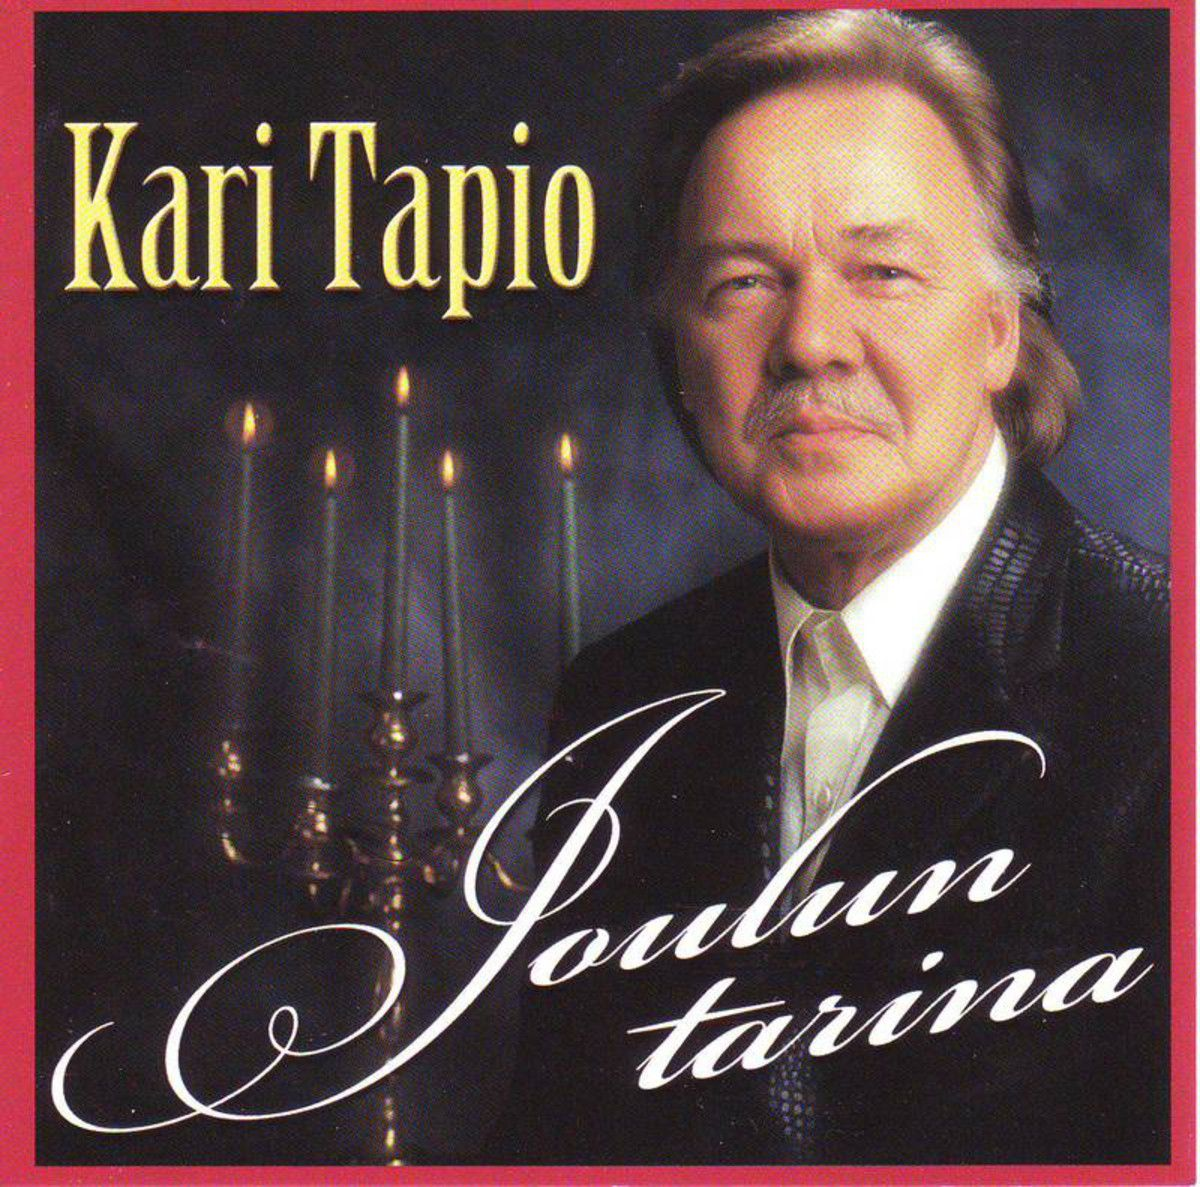 Kari Tapio - Joulun Tarina album cover